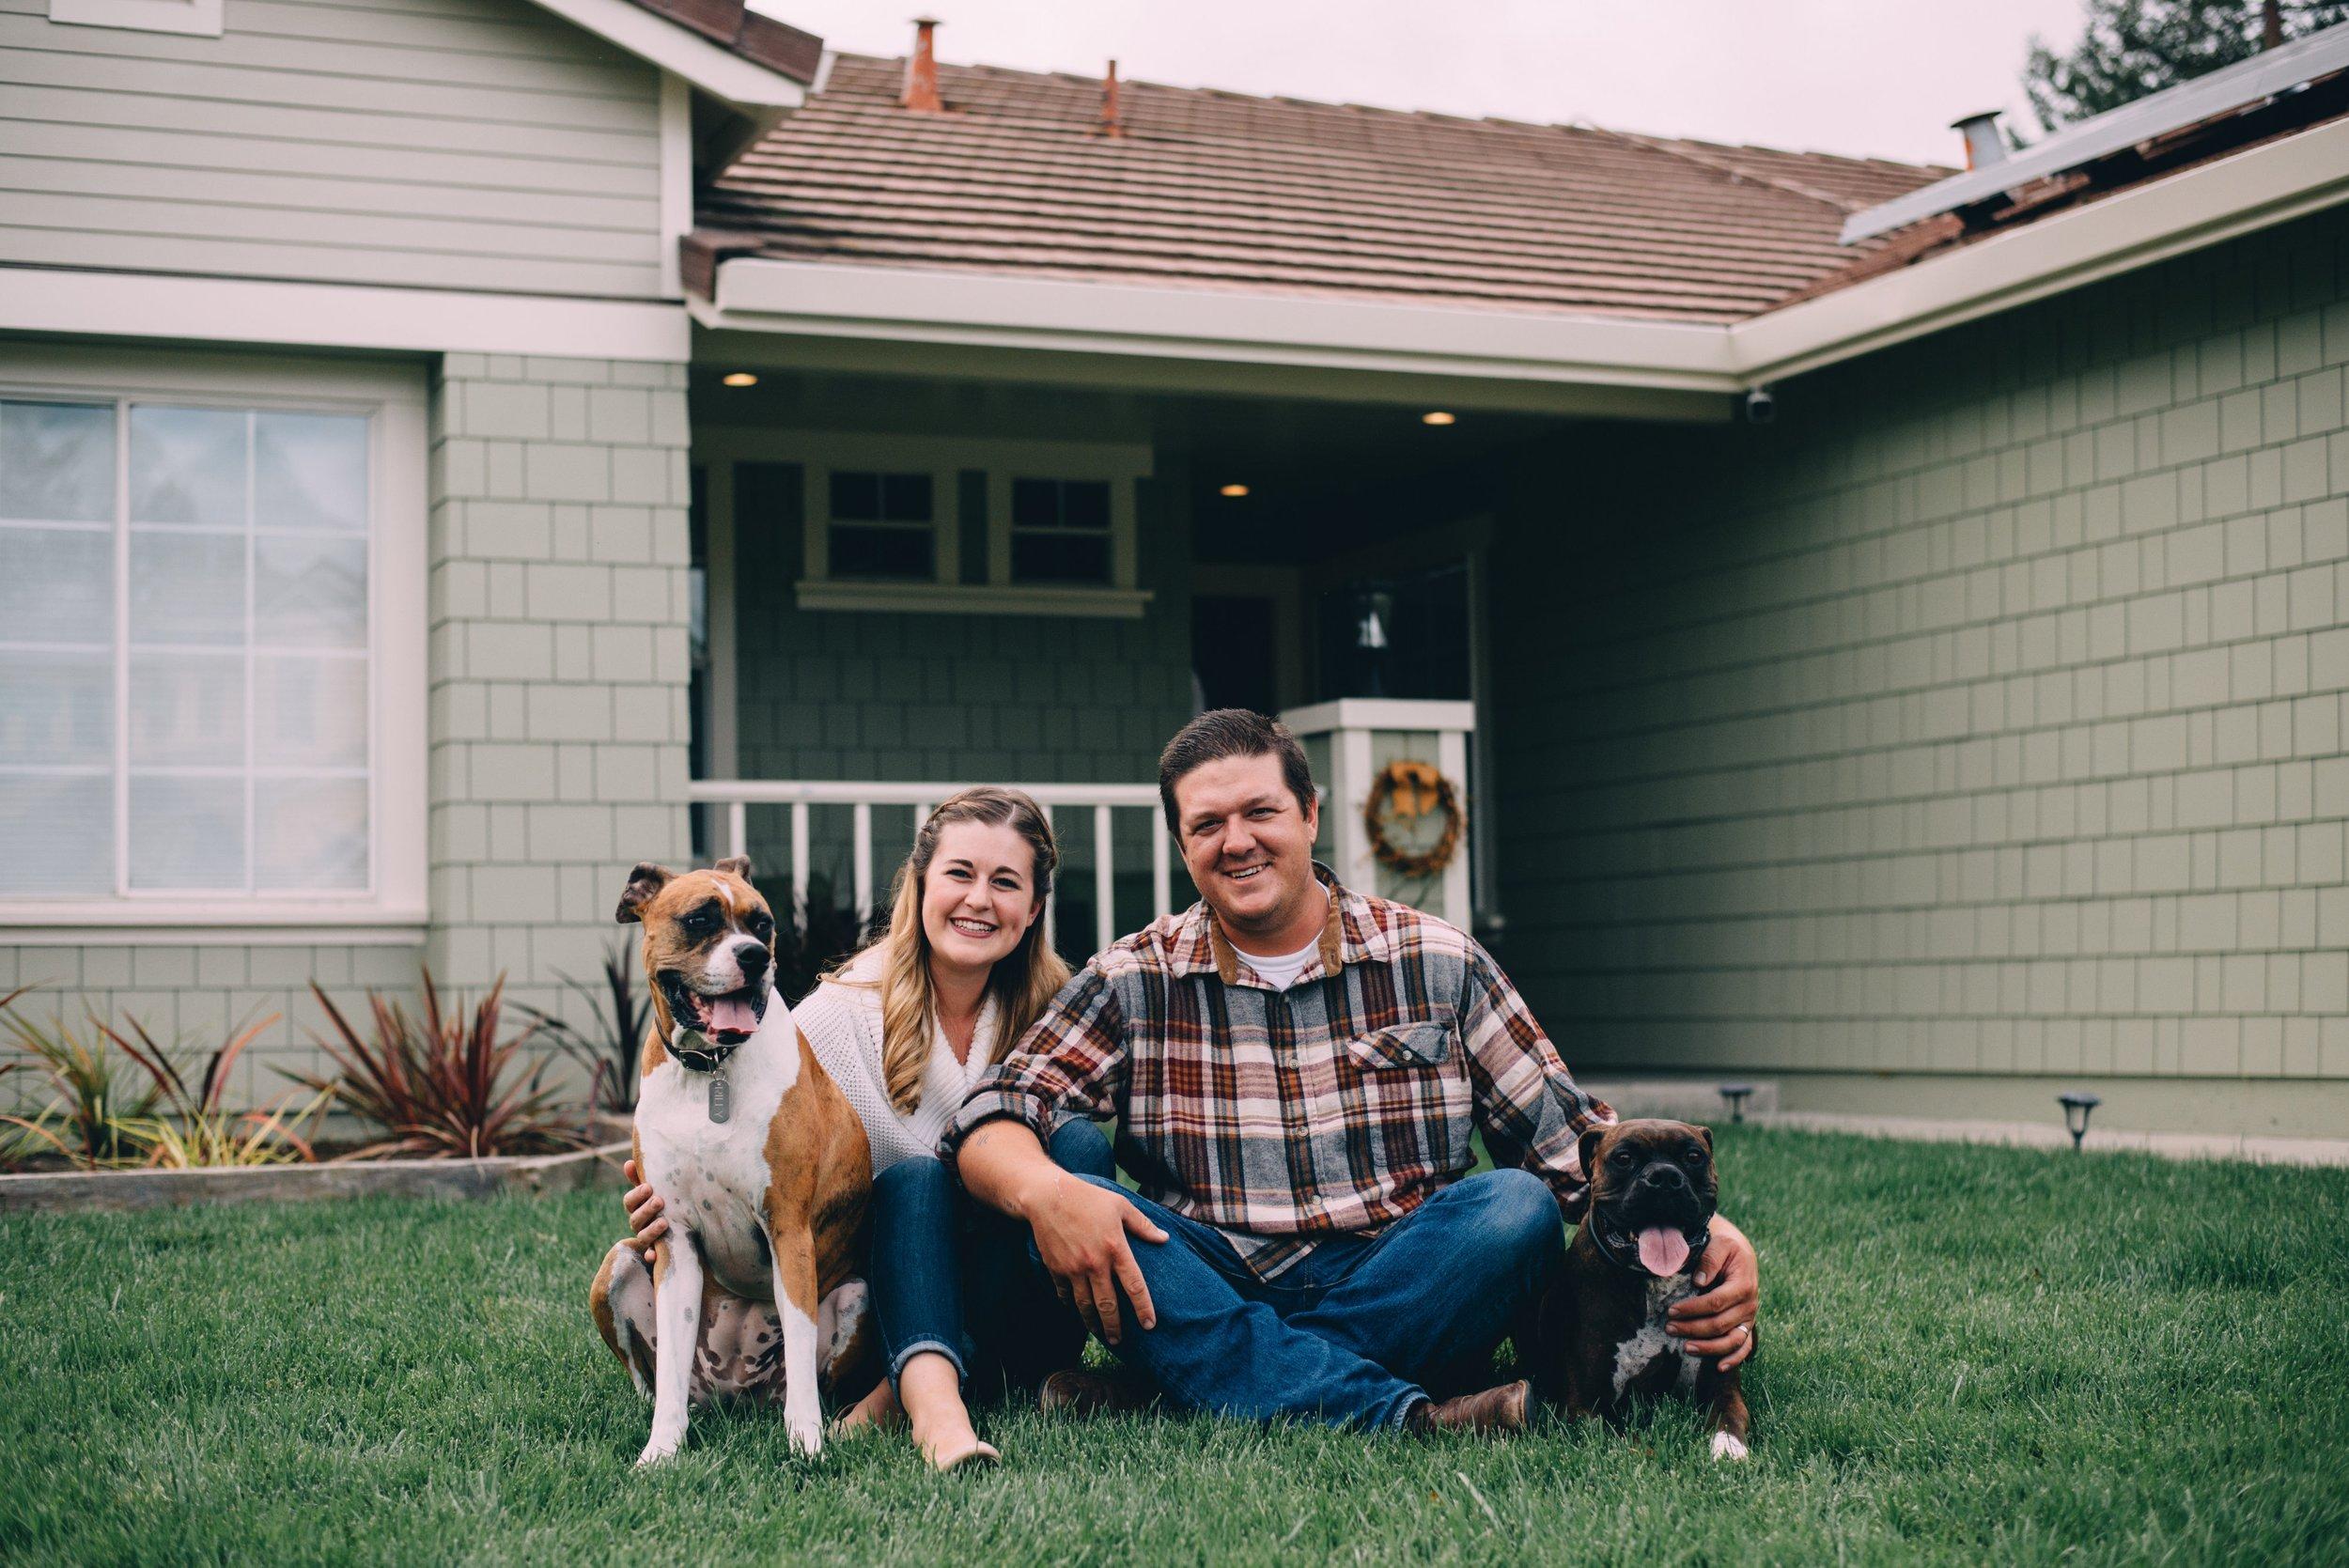 Meet the makers: Connor, Bri, Marlin, & Riley